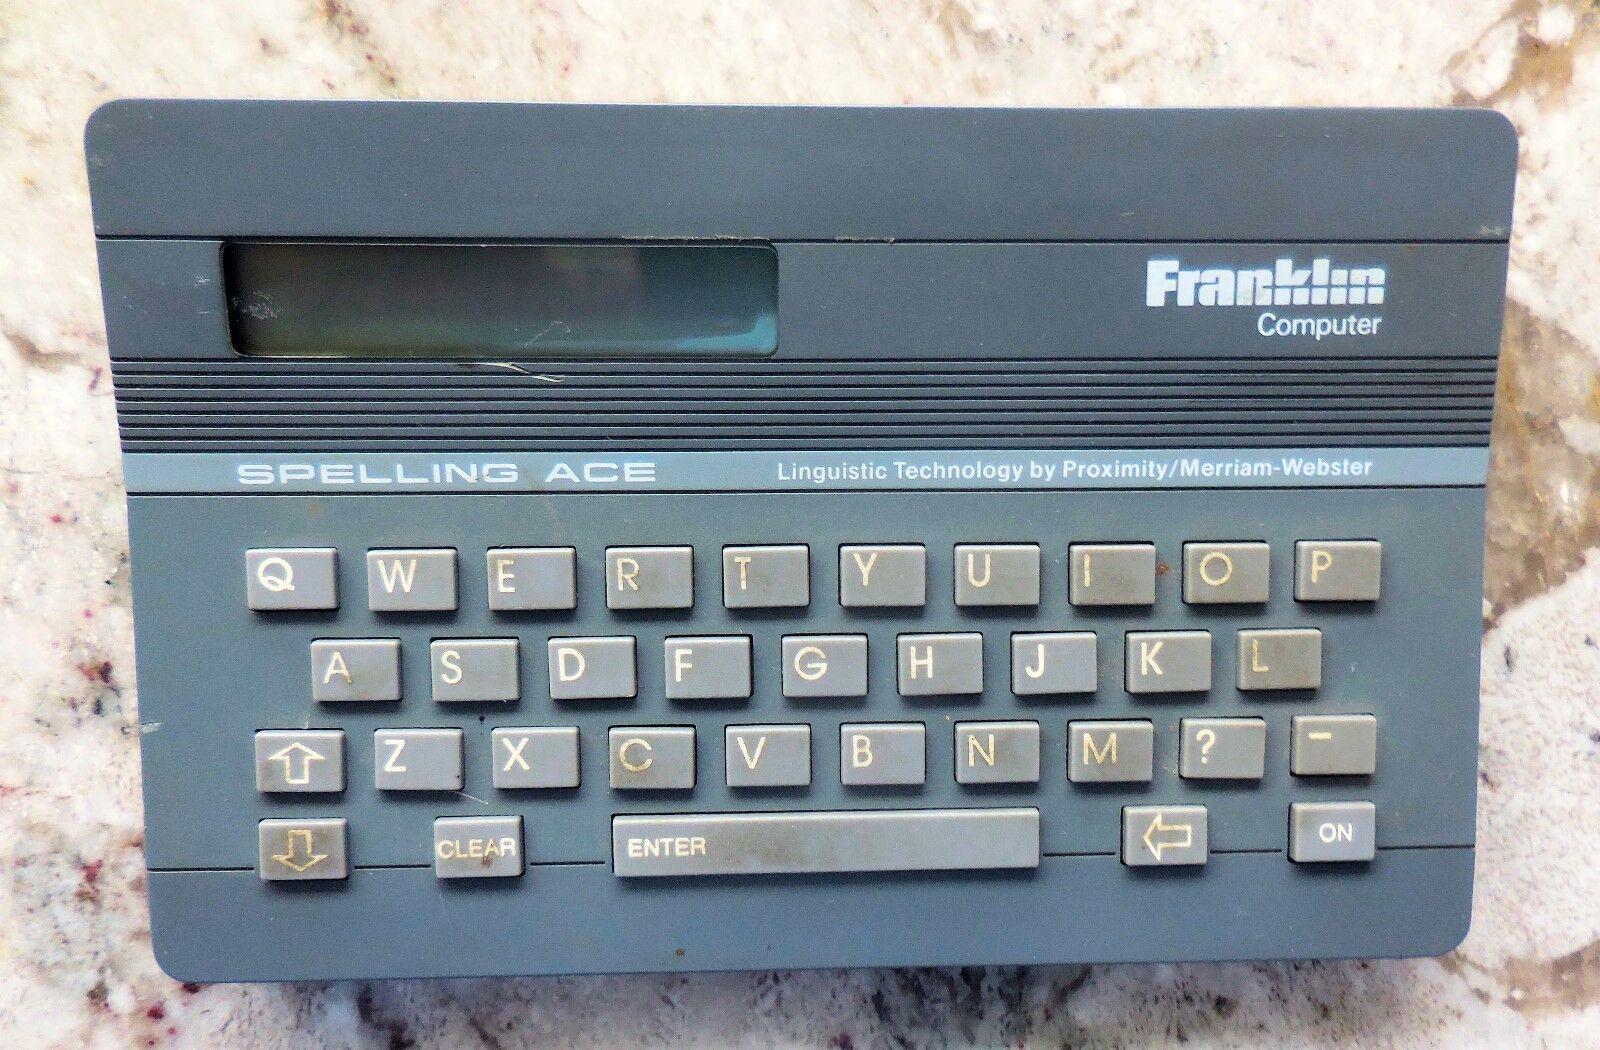 Franklin Computer - 1987 Spelling Ace (SA-98) [Merriam-Webster] (EUC)